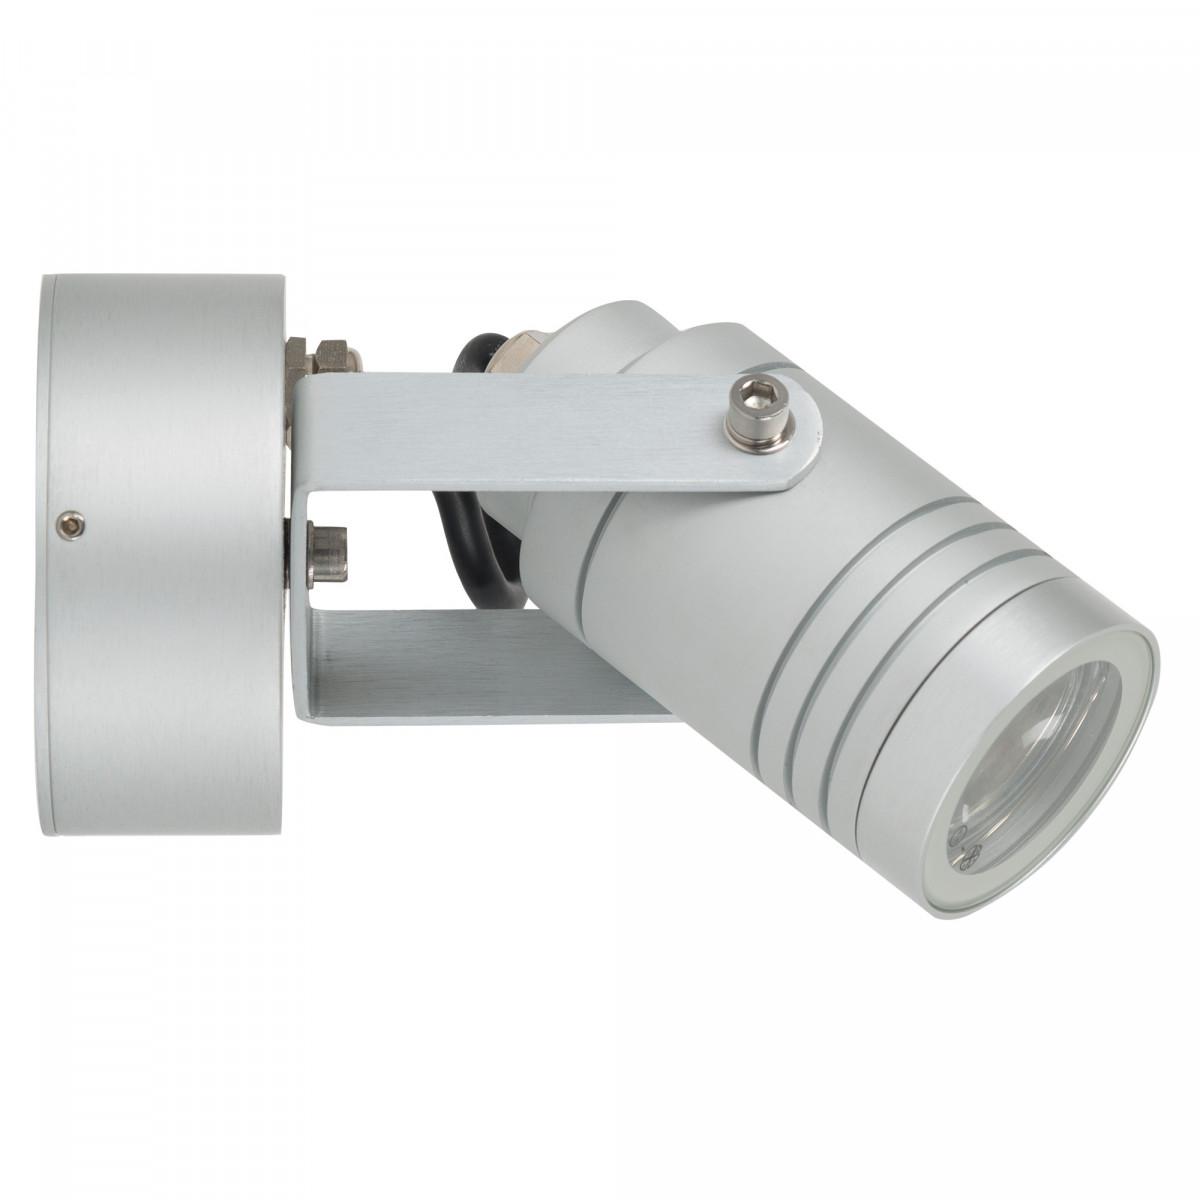 Beamy LED-Bodenstrahlermit GU10 LED Leuchte | Nostalux.de